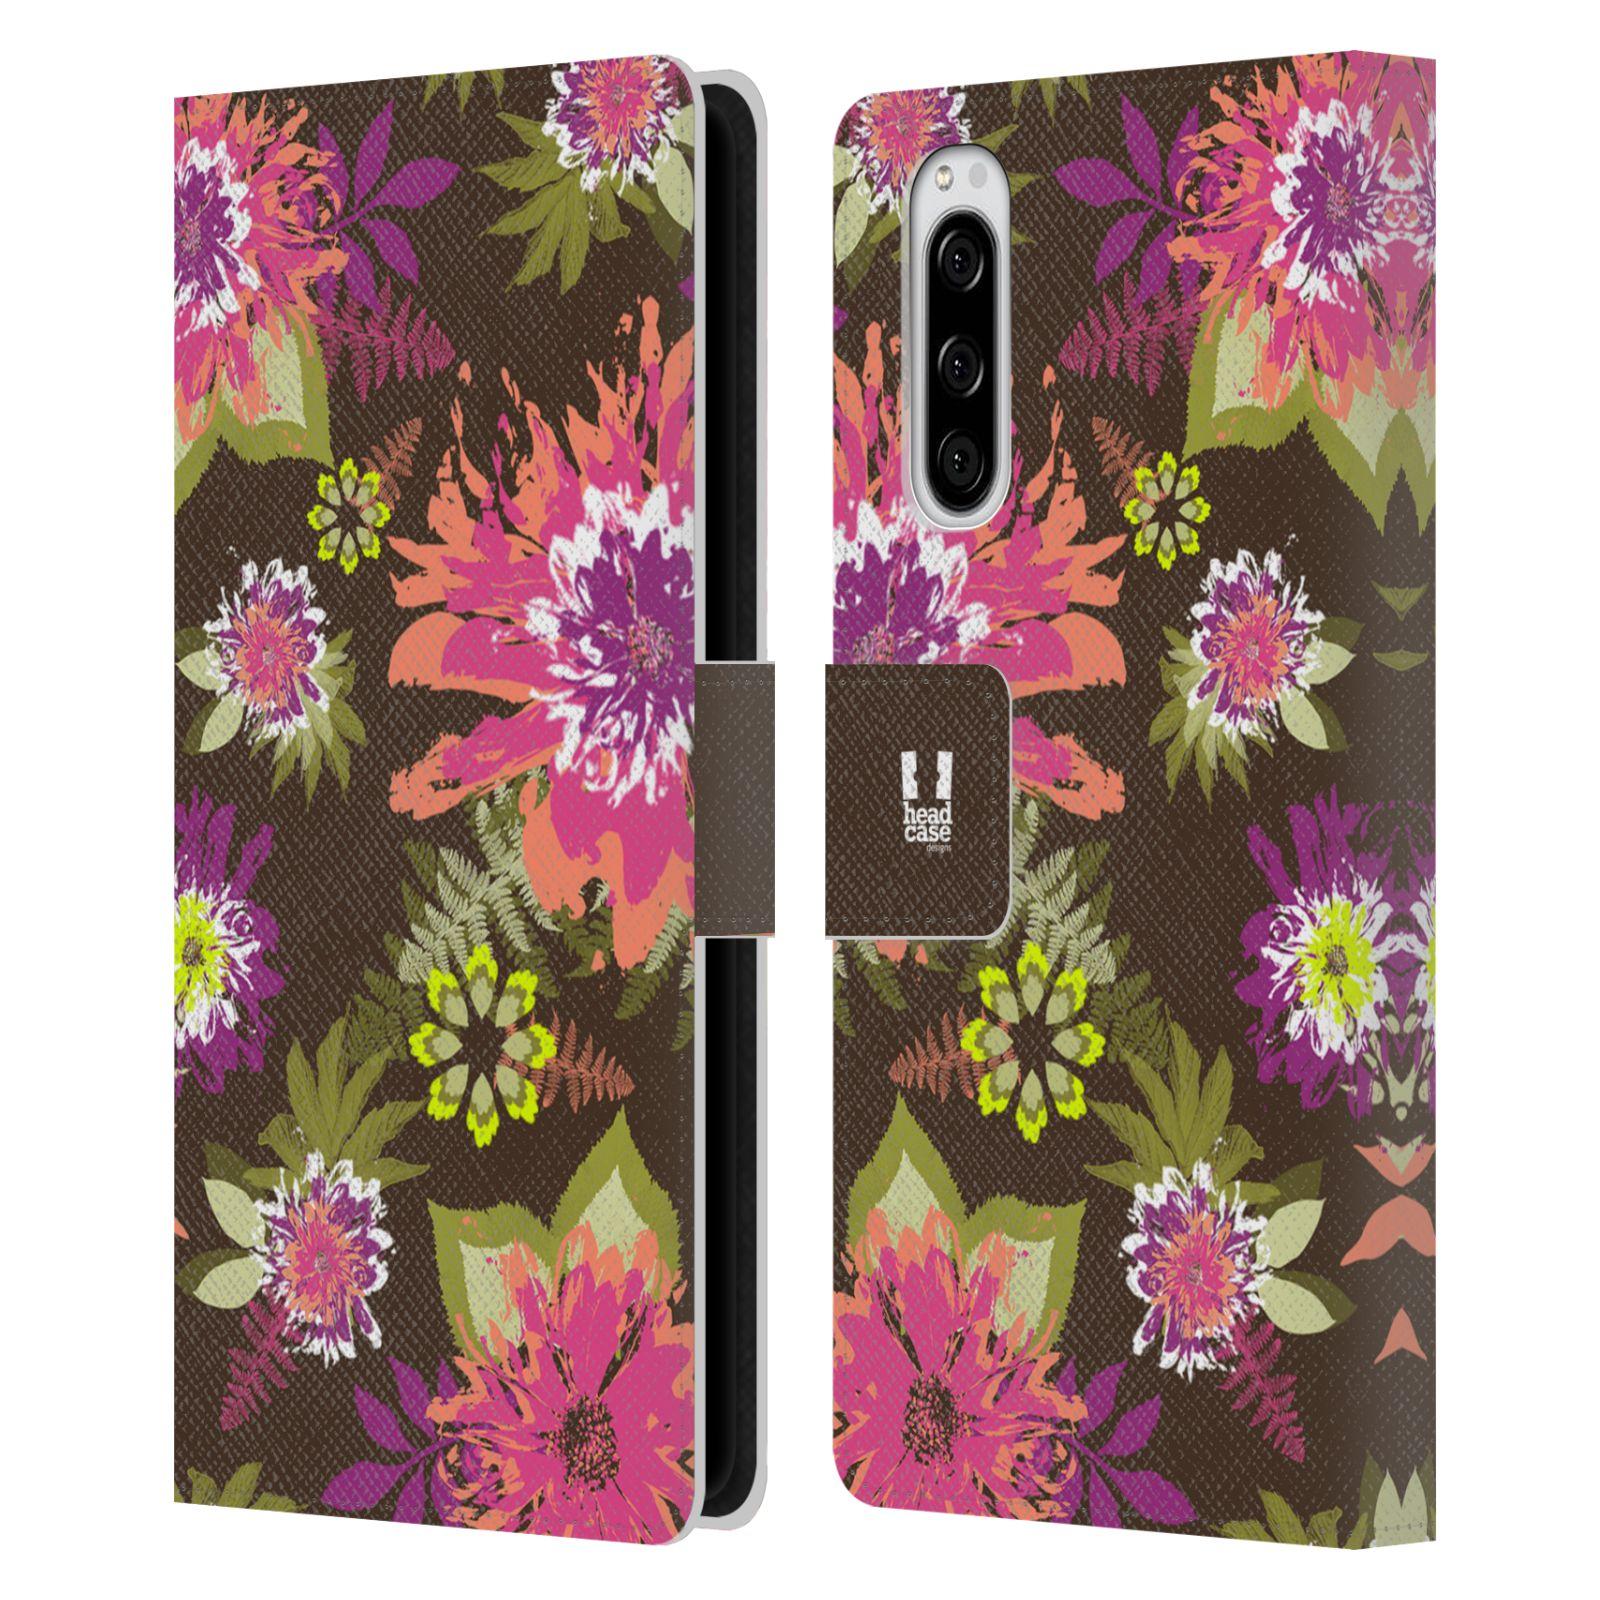 Pouzdro na mobil Sony Xperia 5 BOTANIKA barevné květy zelená